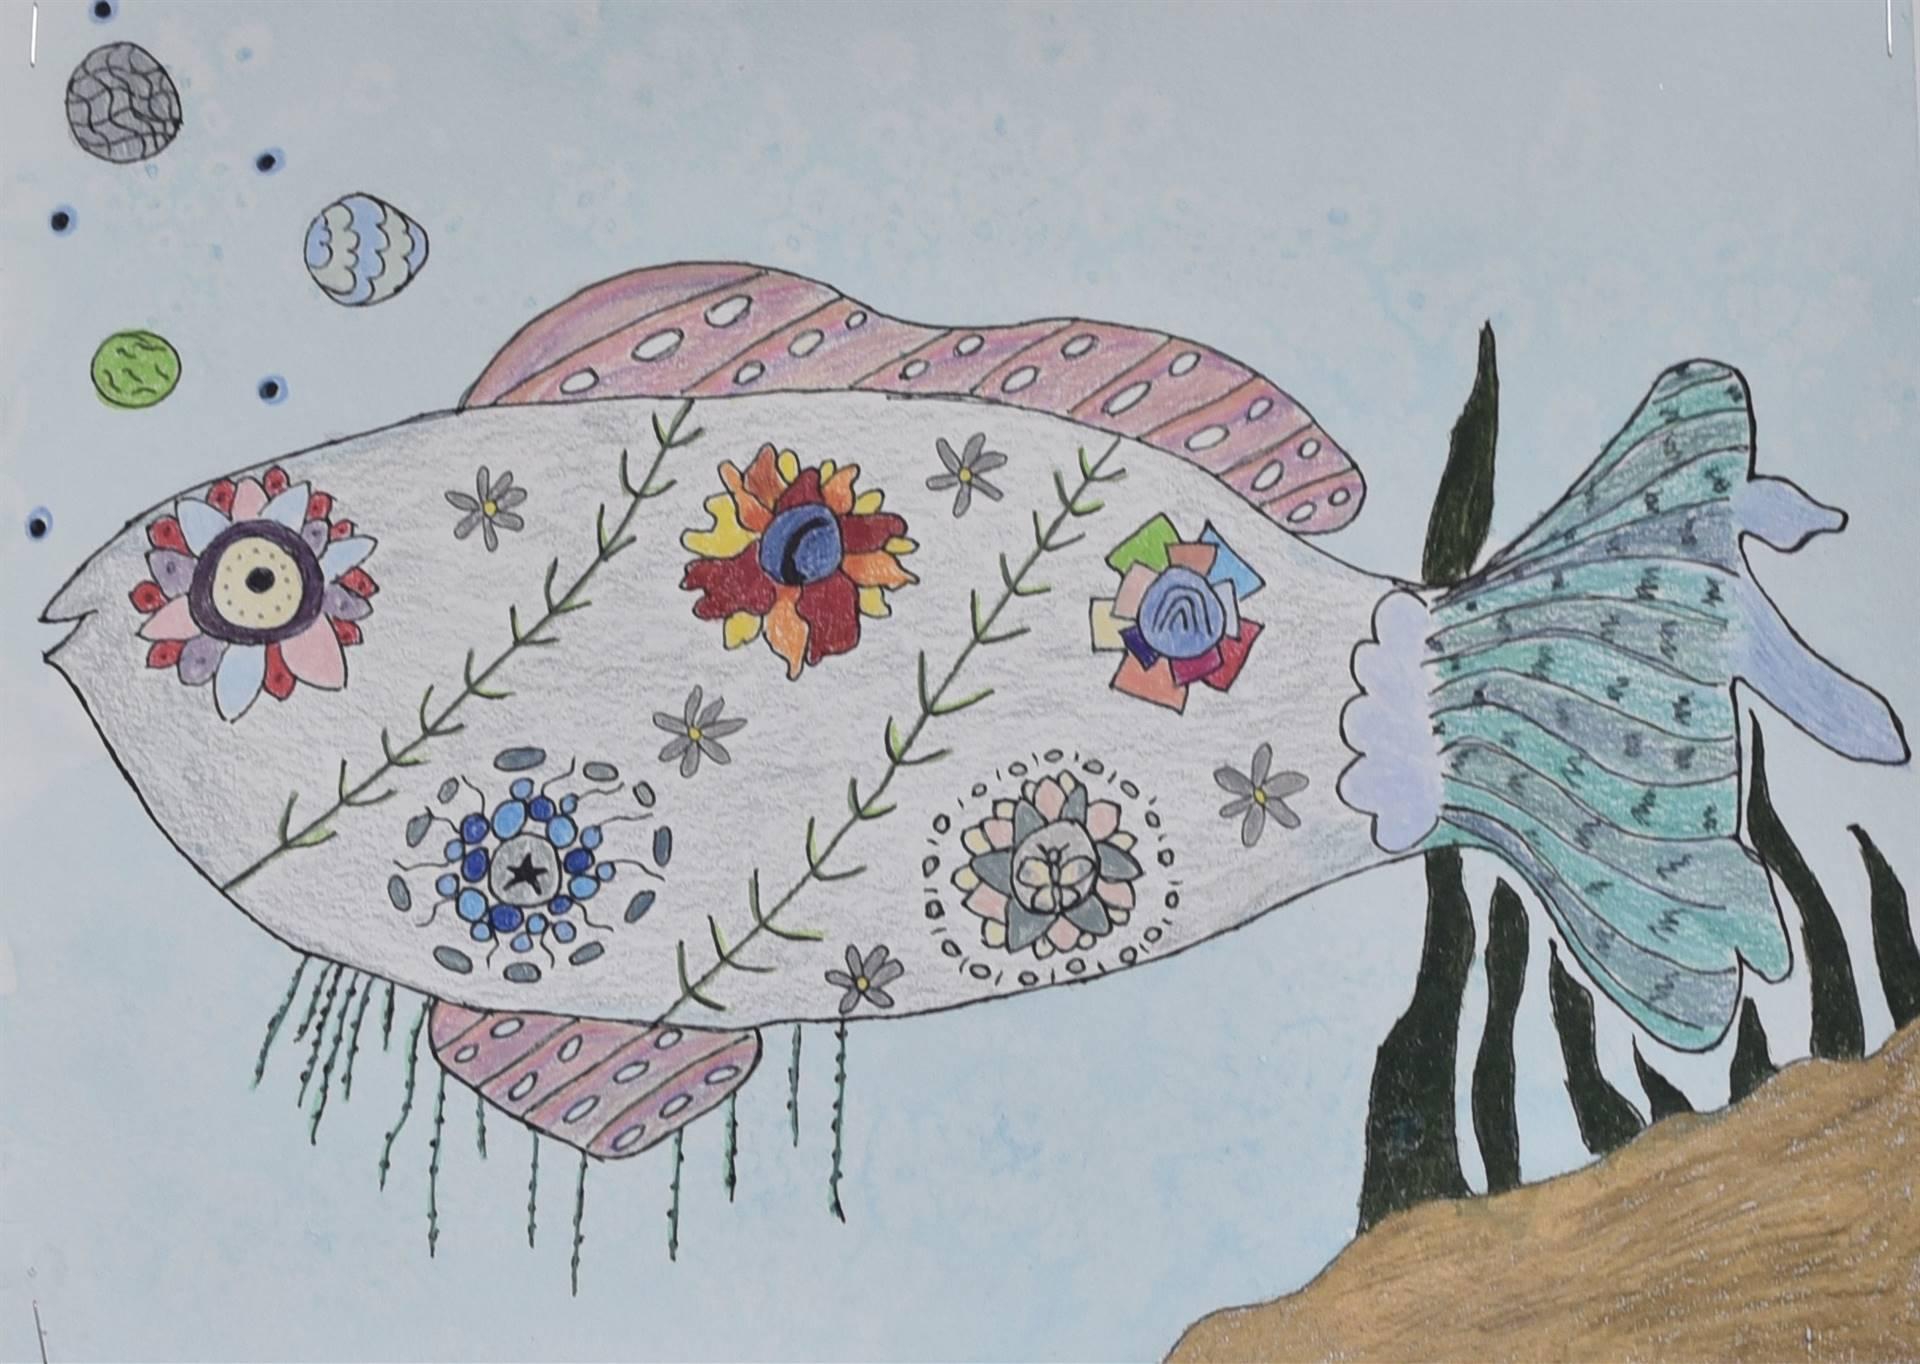 Brecksville-Broadview Hts. Middle School Art Projects 145